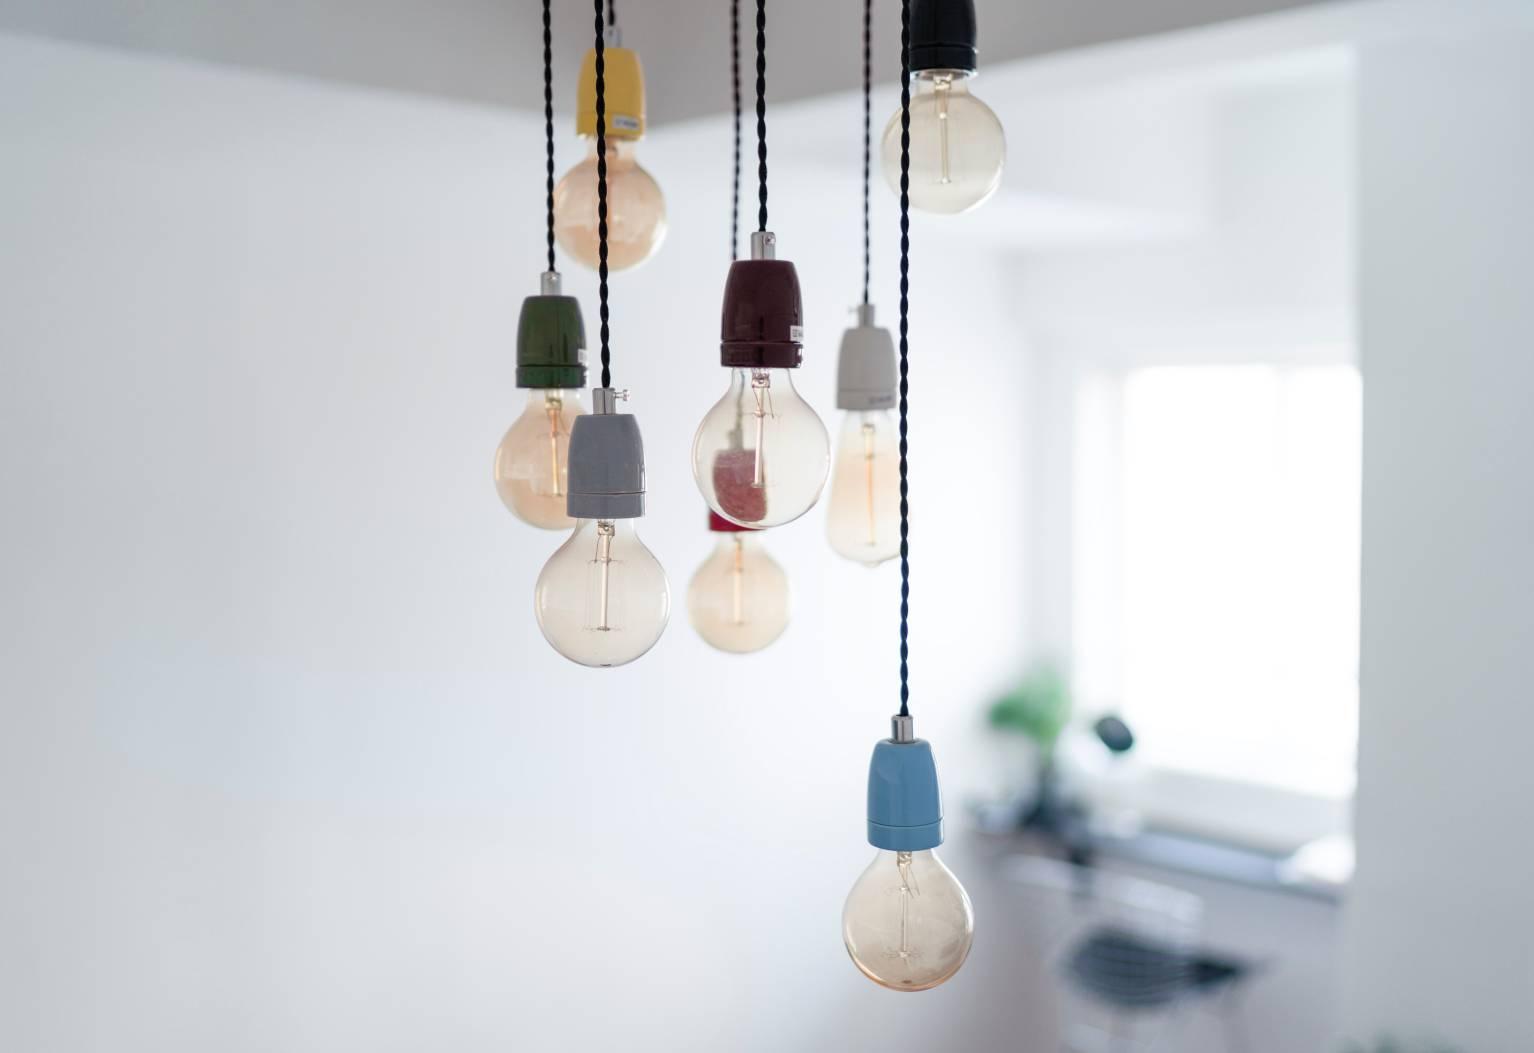 Image of light bulb array